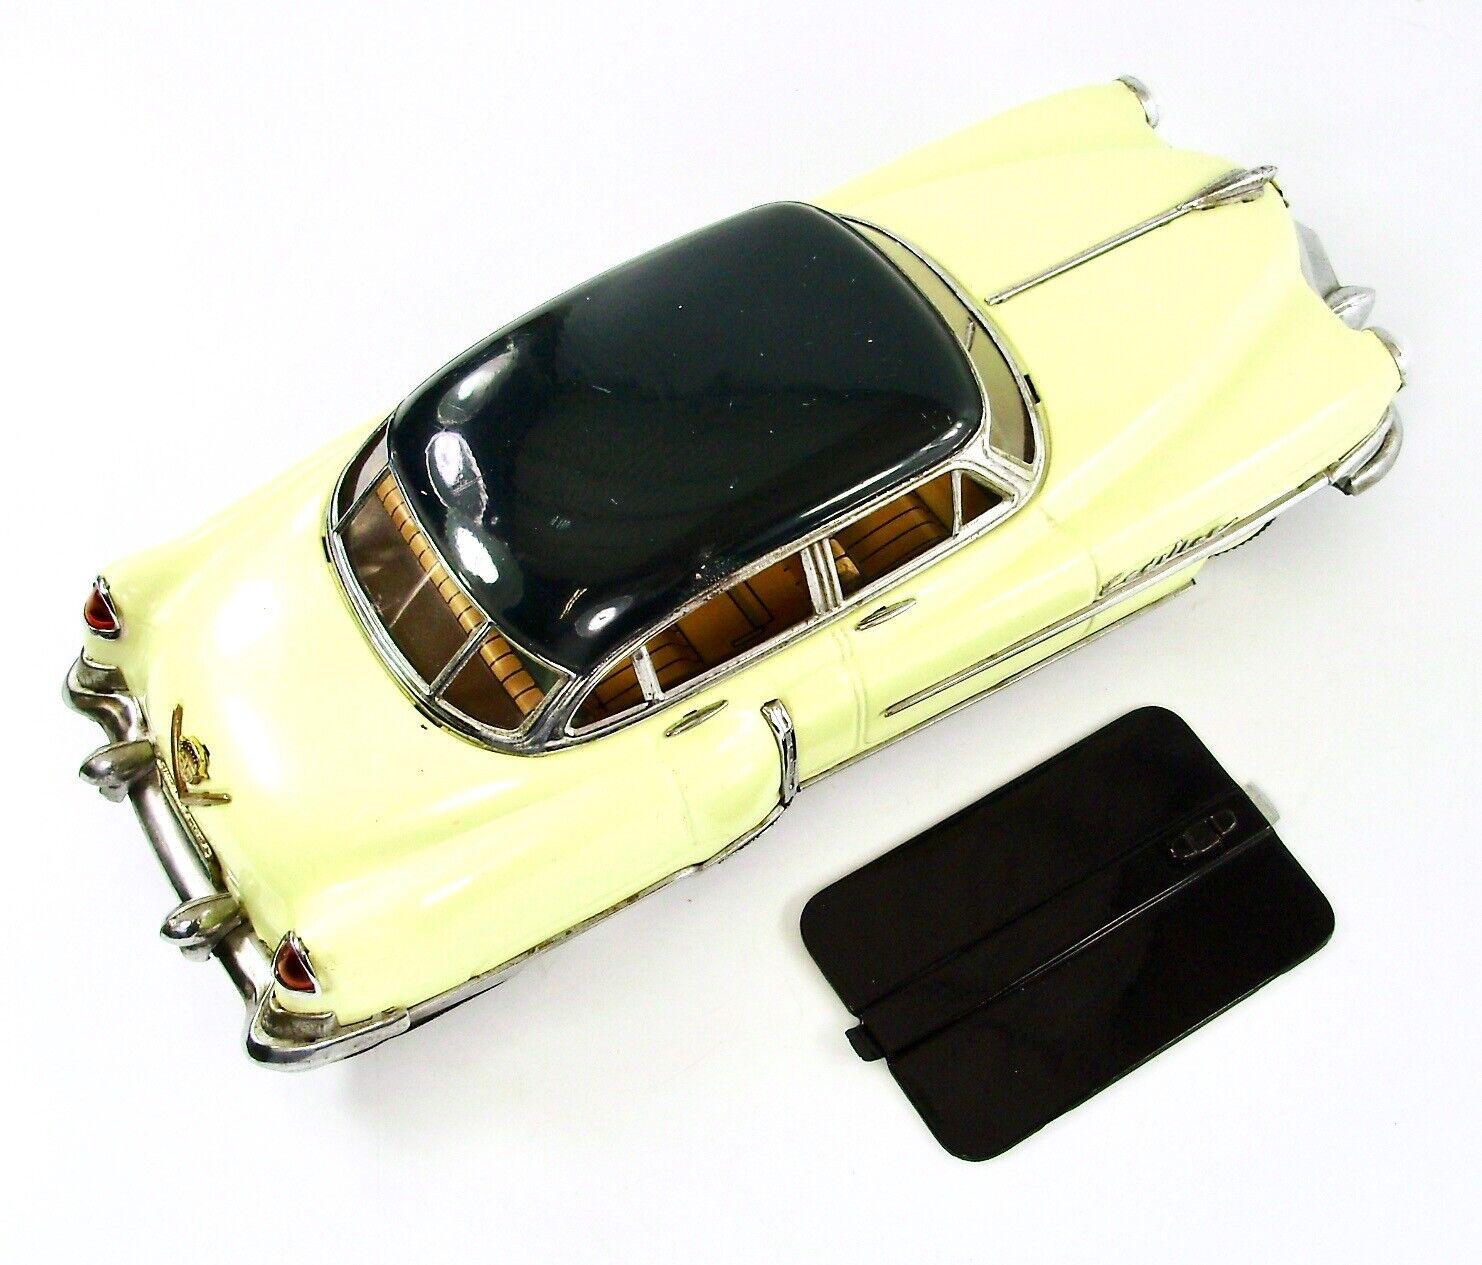 Marusan Cadillac Cadillac Cadillac Replacement Battery Cover 551717